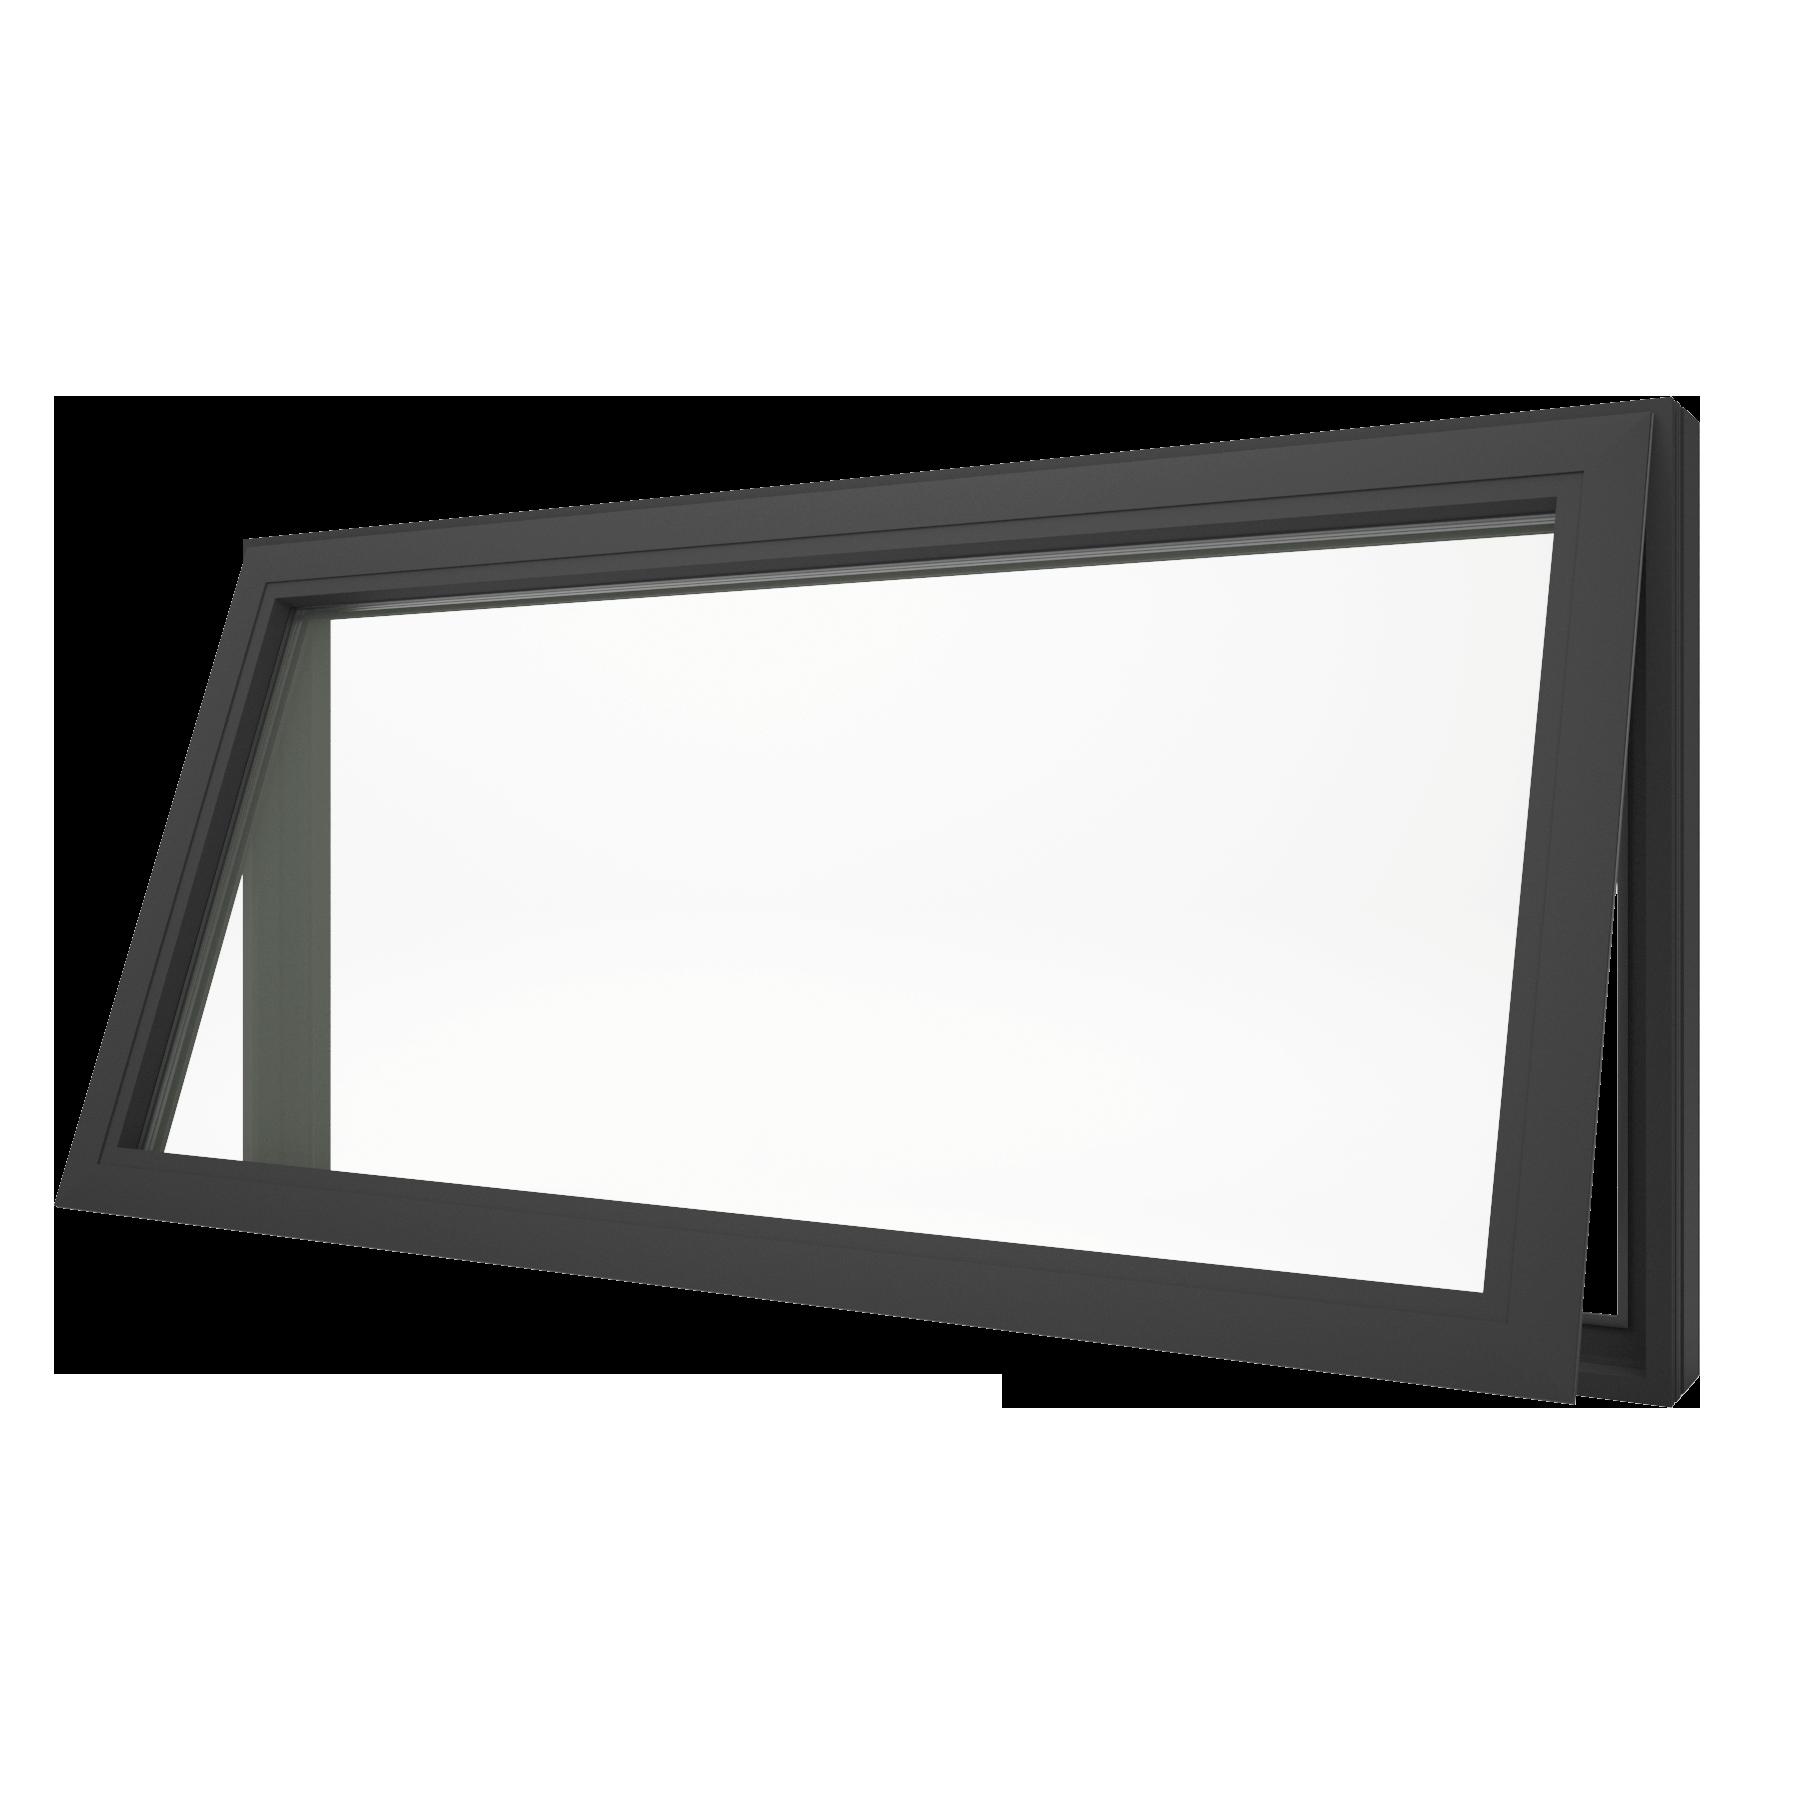 Awning-Window-black-open